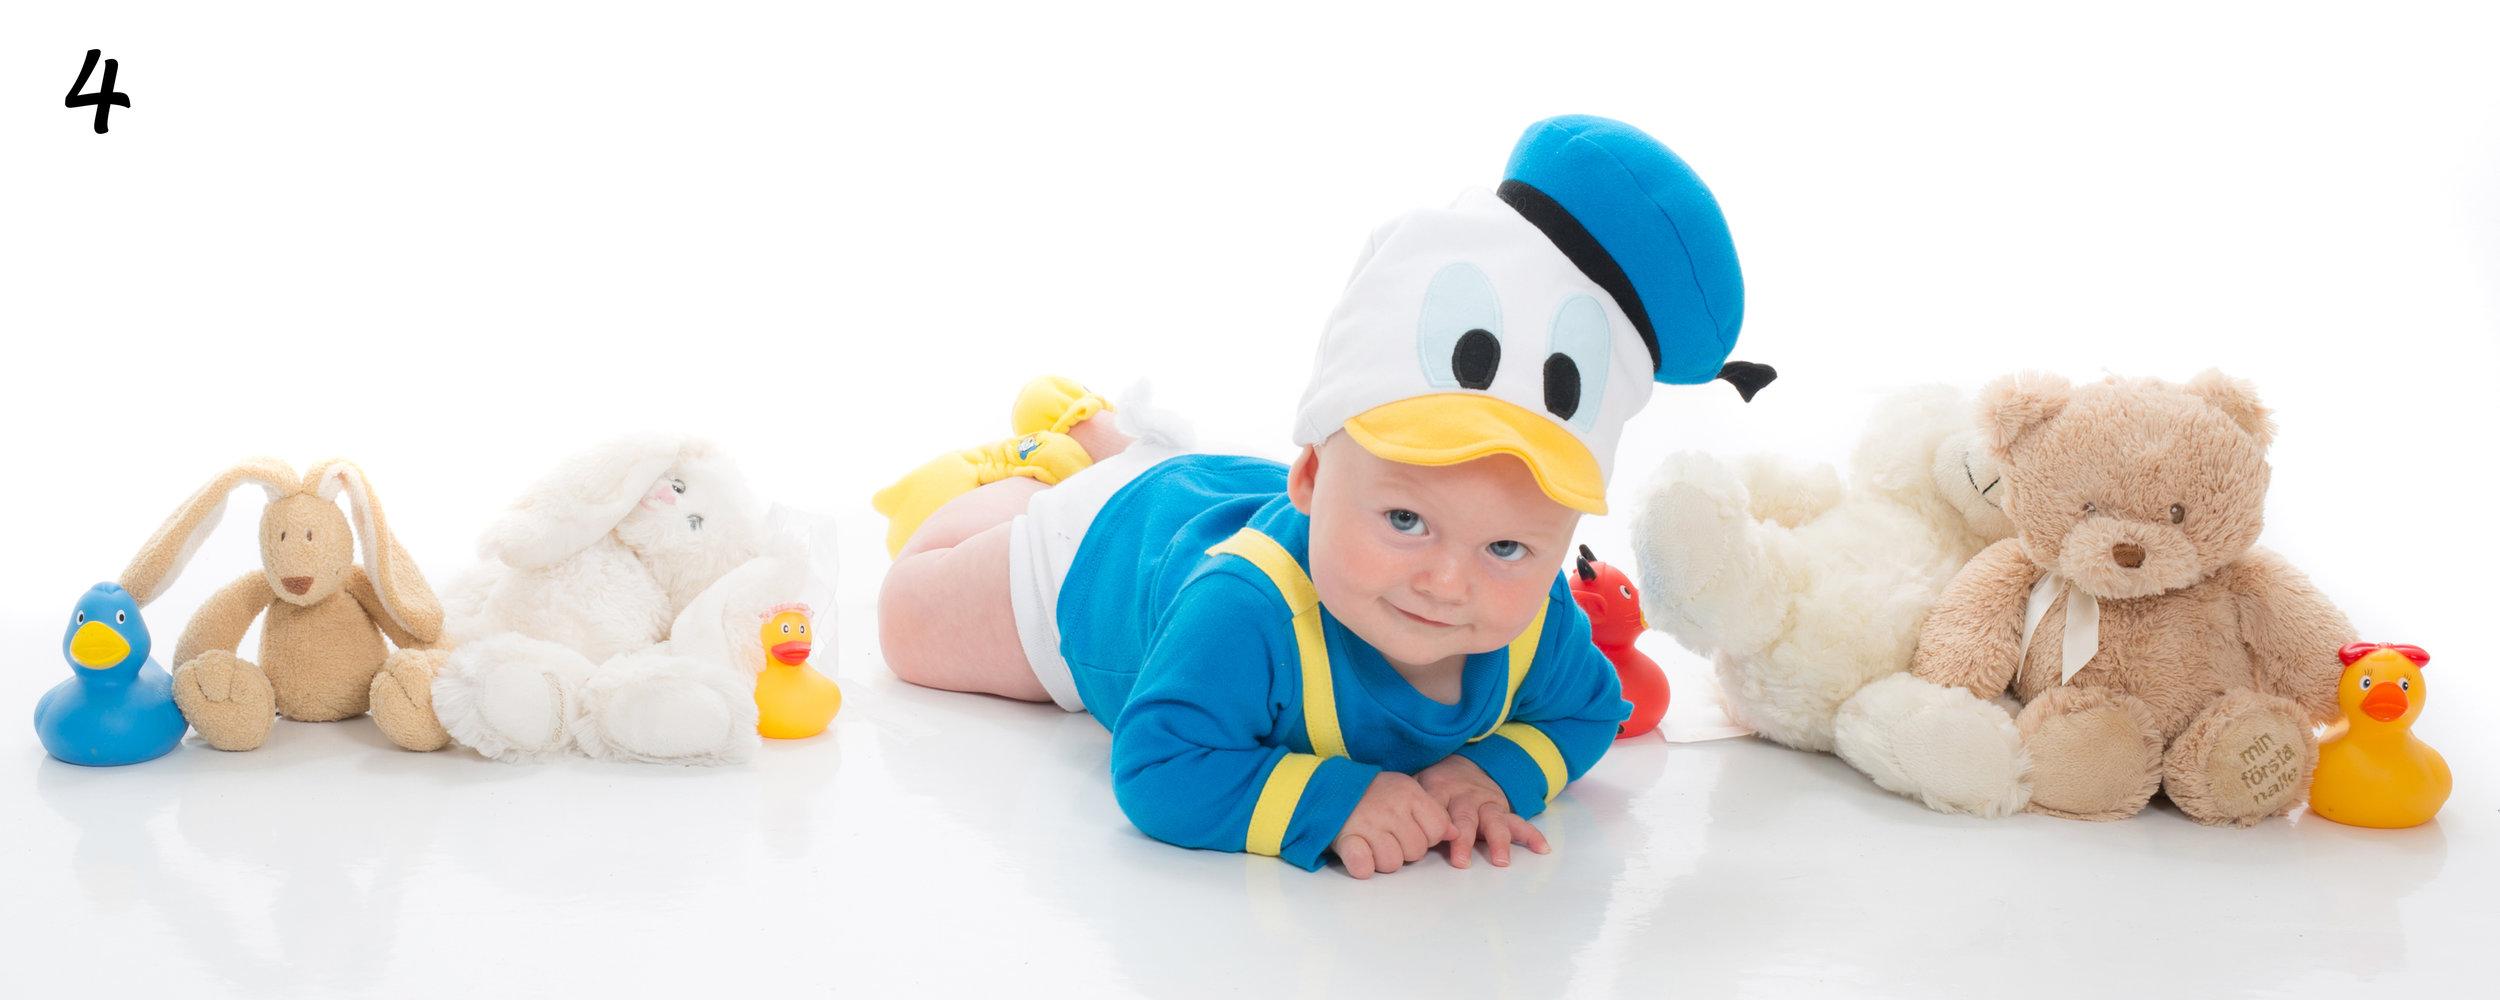 barnfotograf tidaholm